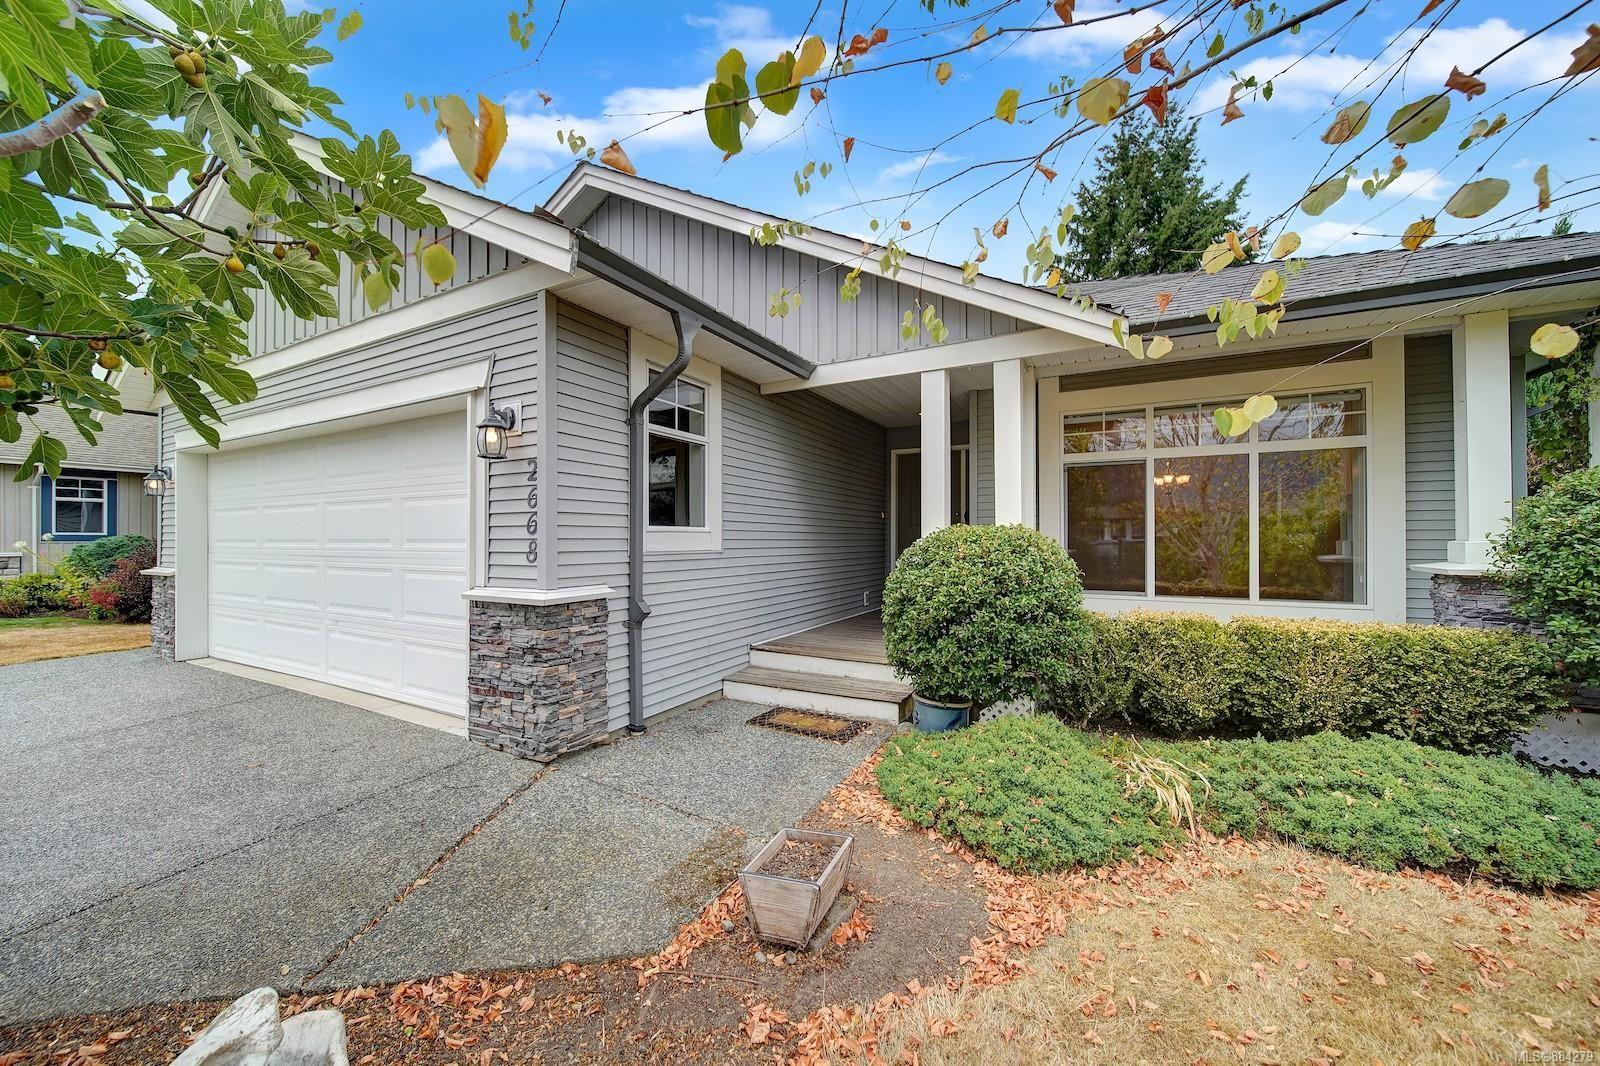 Main Photo: 2668 Jasmine Pl in : Na Diver Lake House for sale (Nanaimo)  : MLS®# 884279